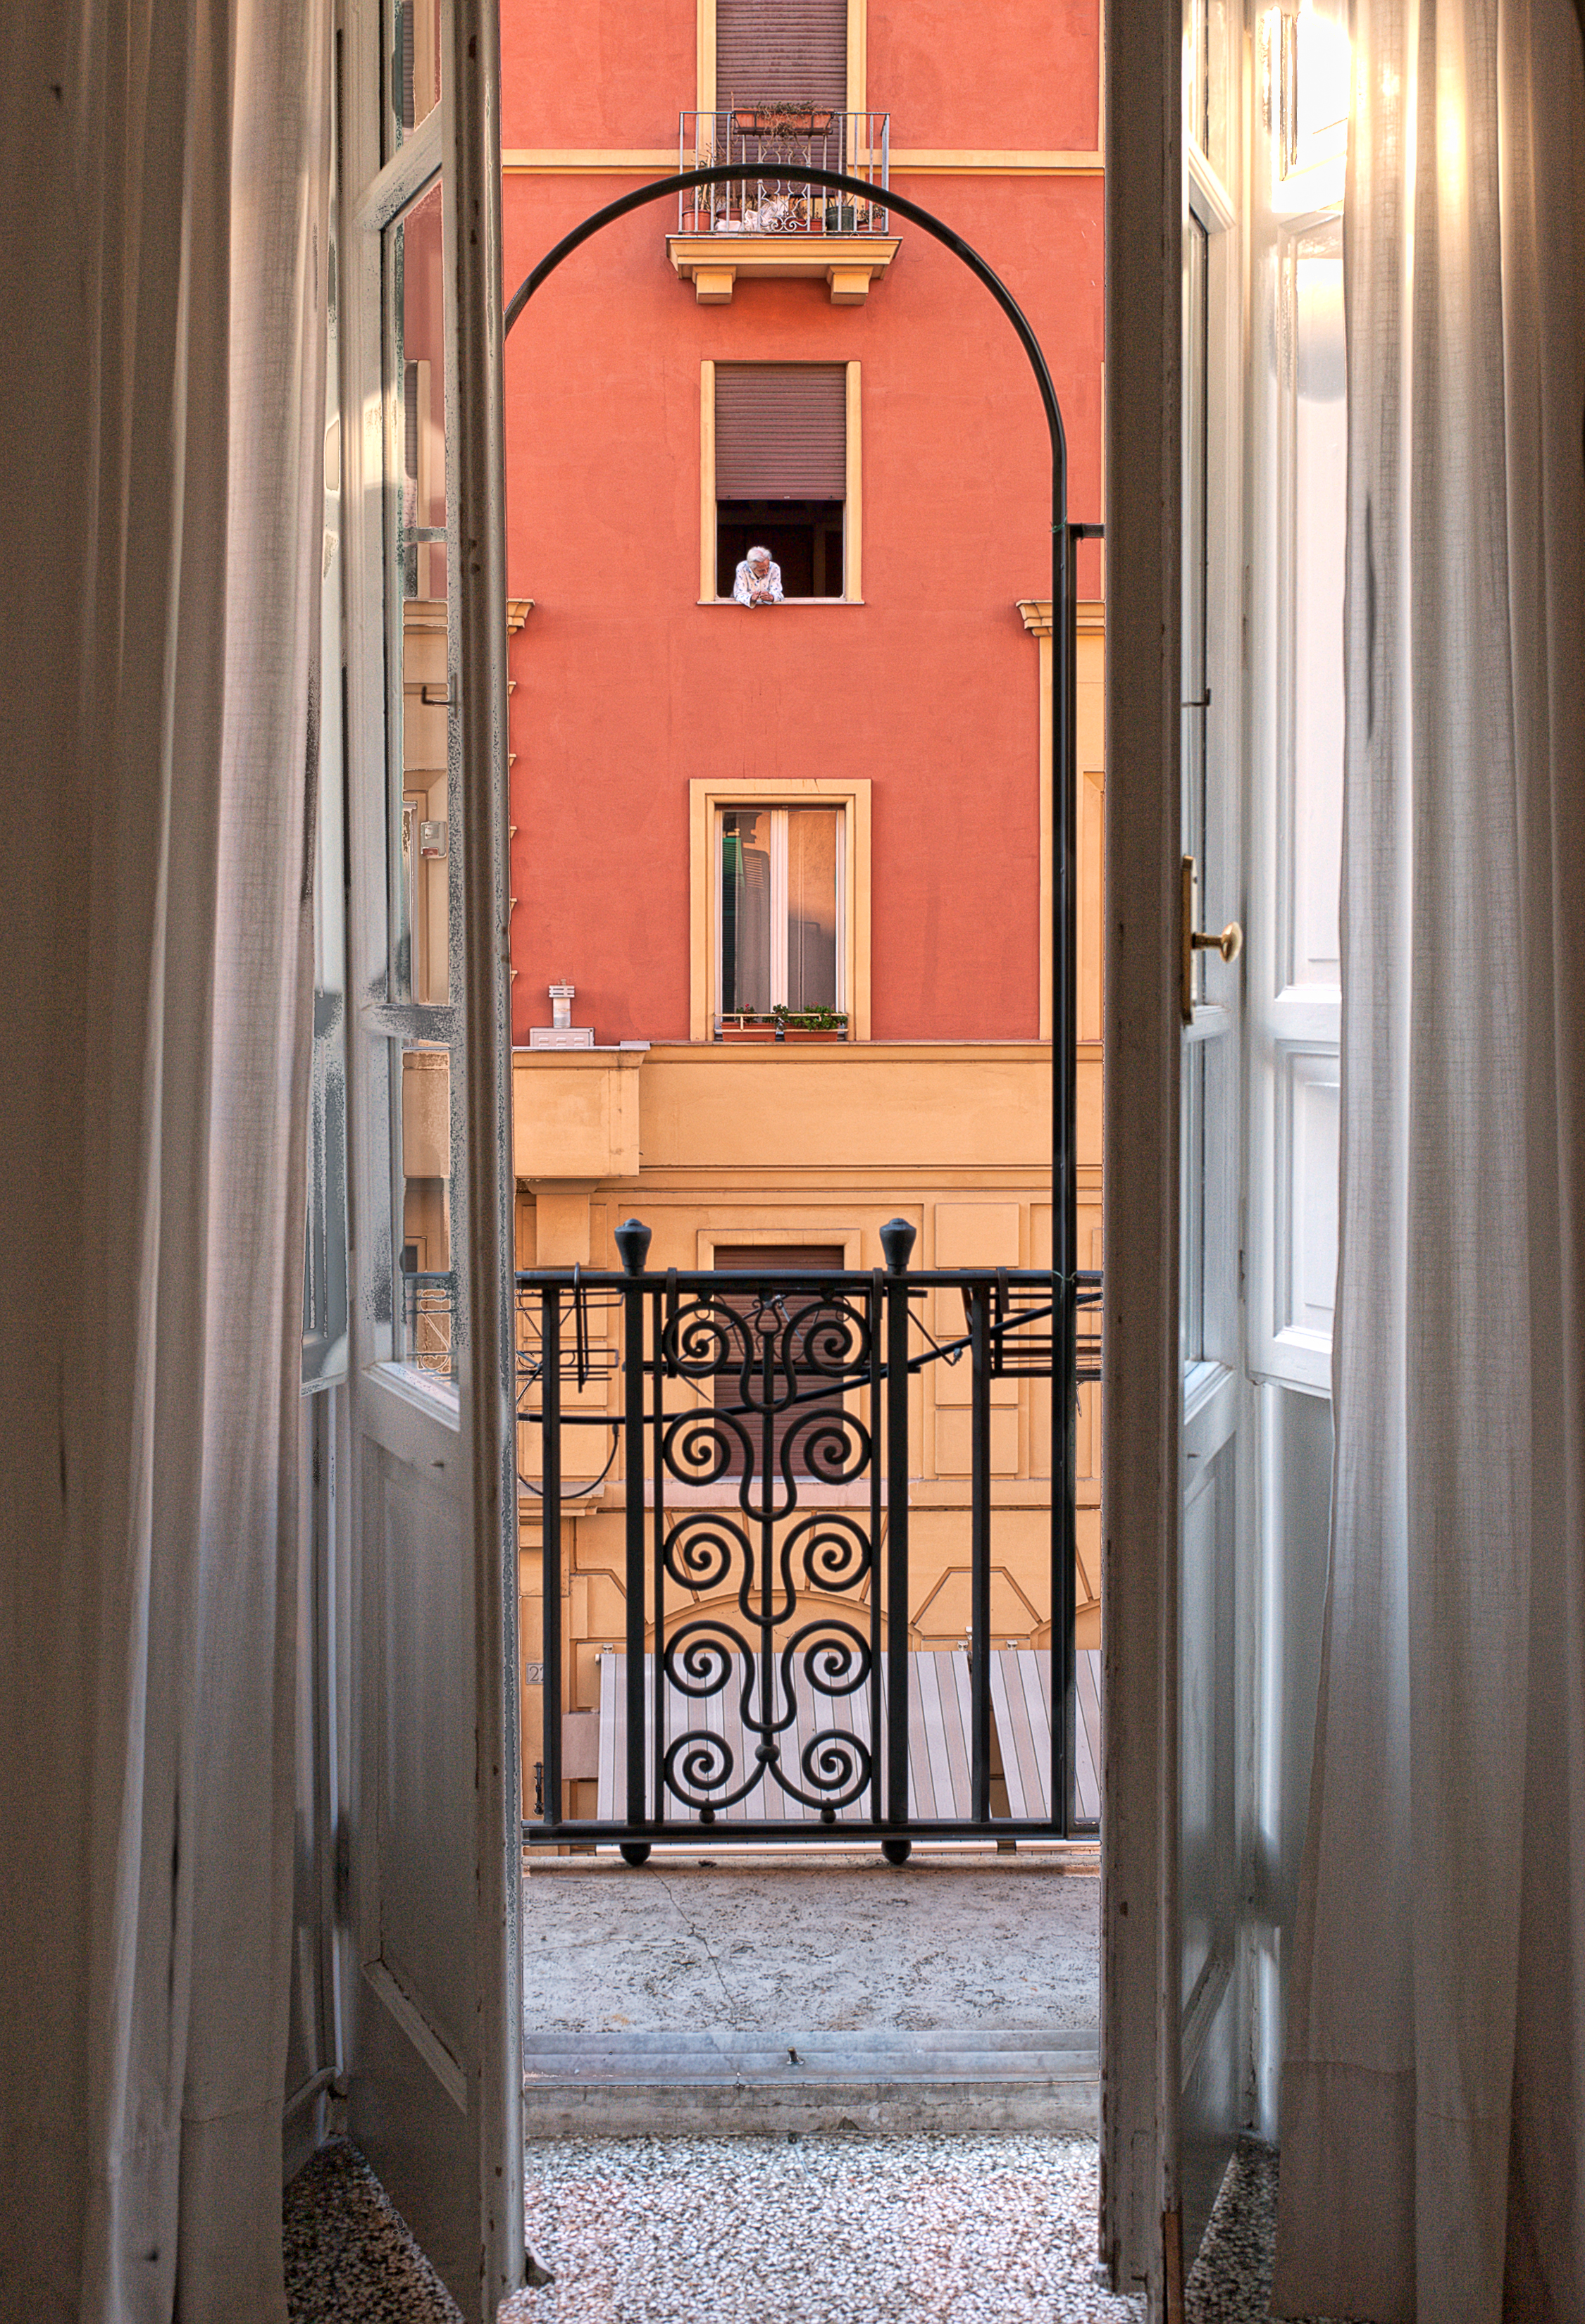 Italy-John Bardell-0646a.jpg